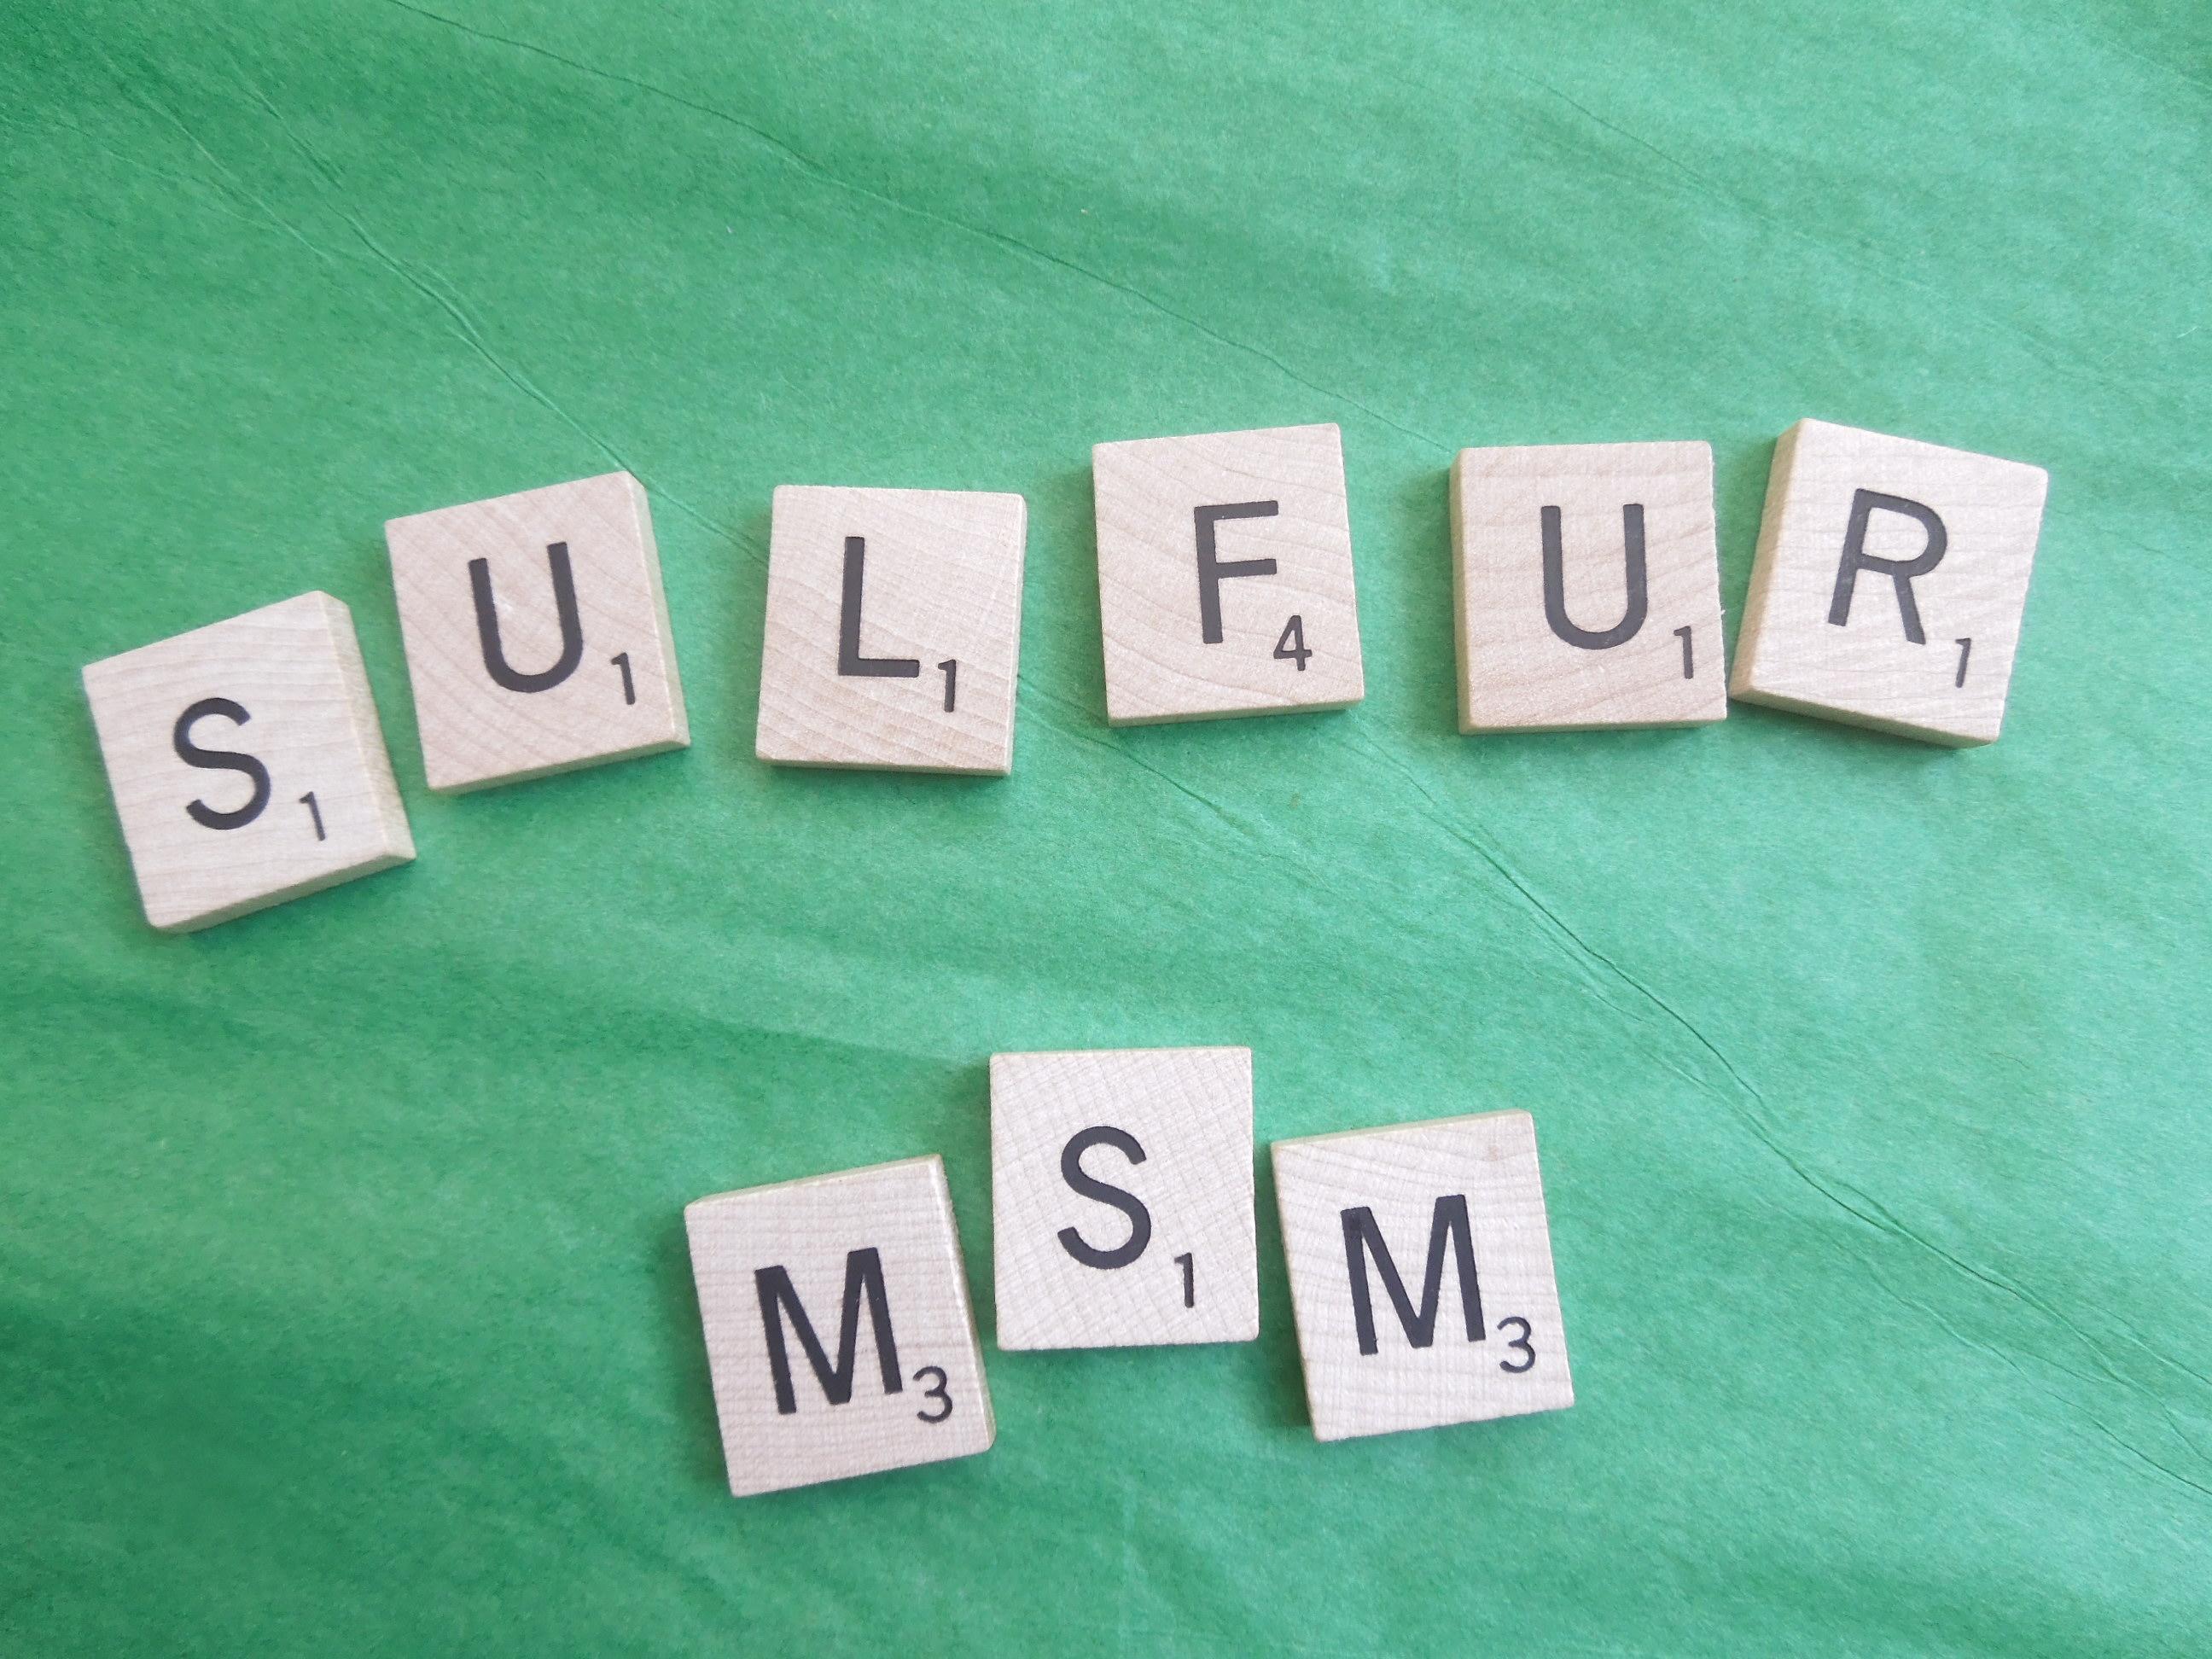 MSM Sulfur